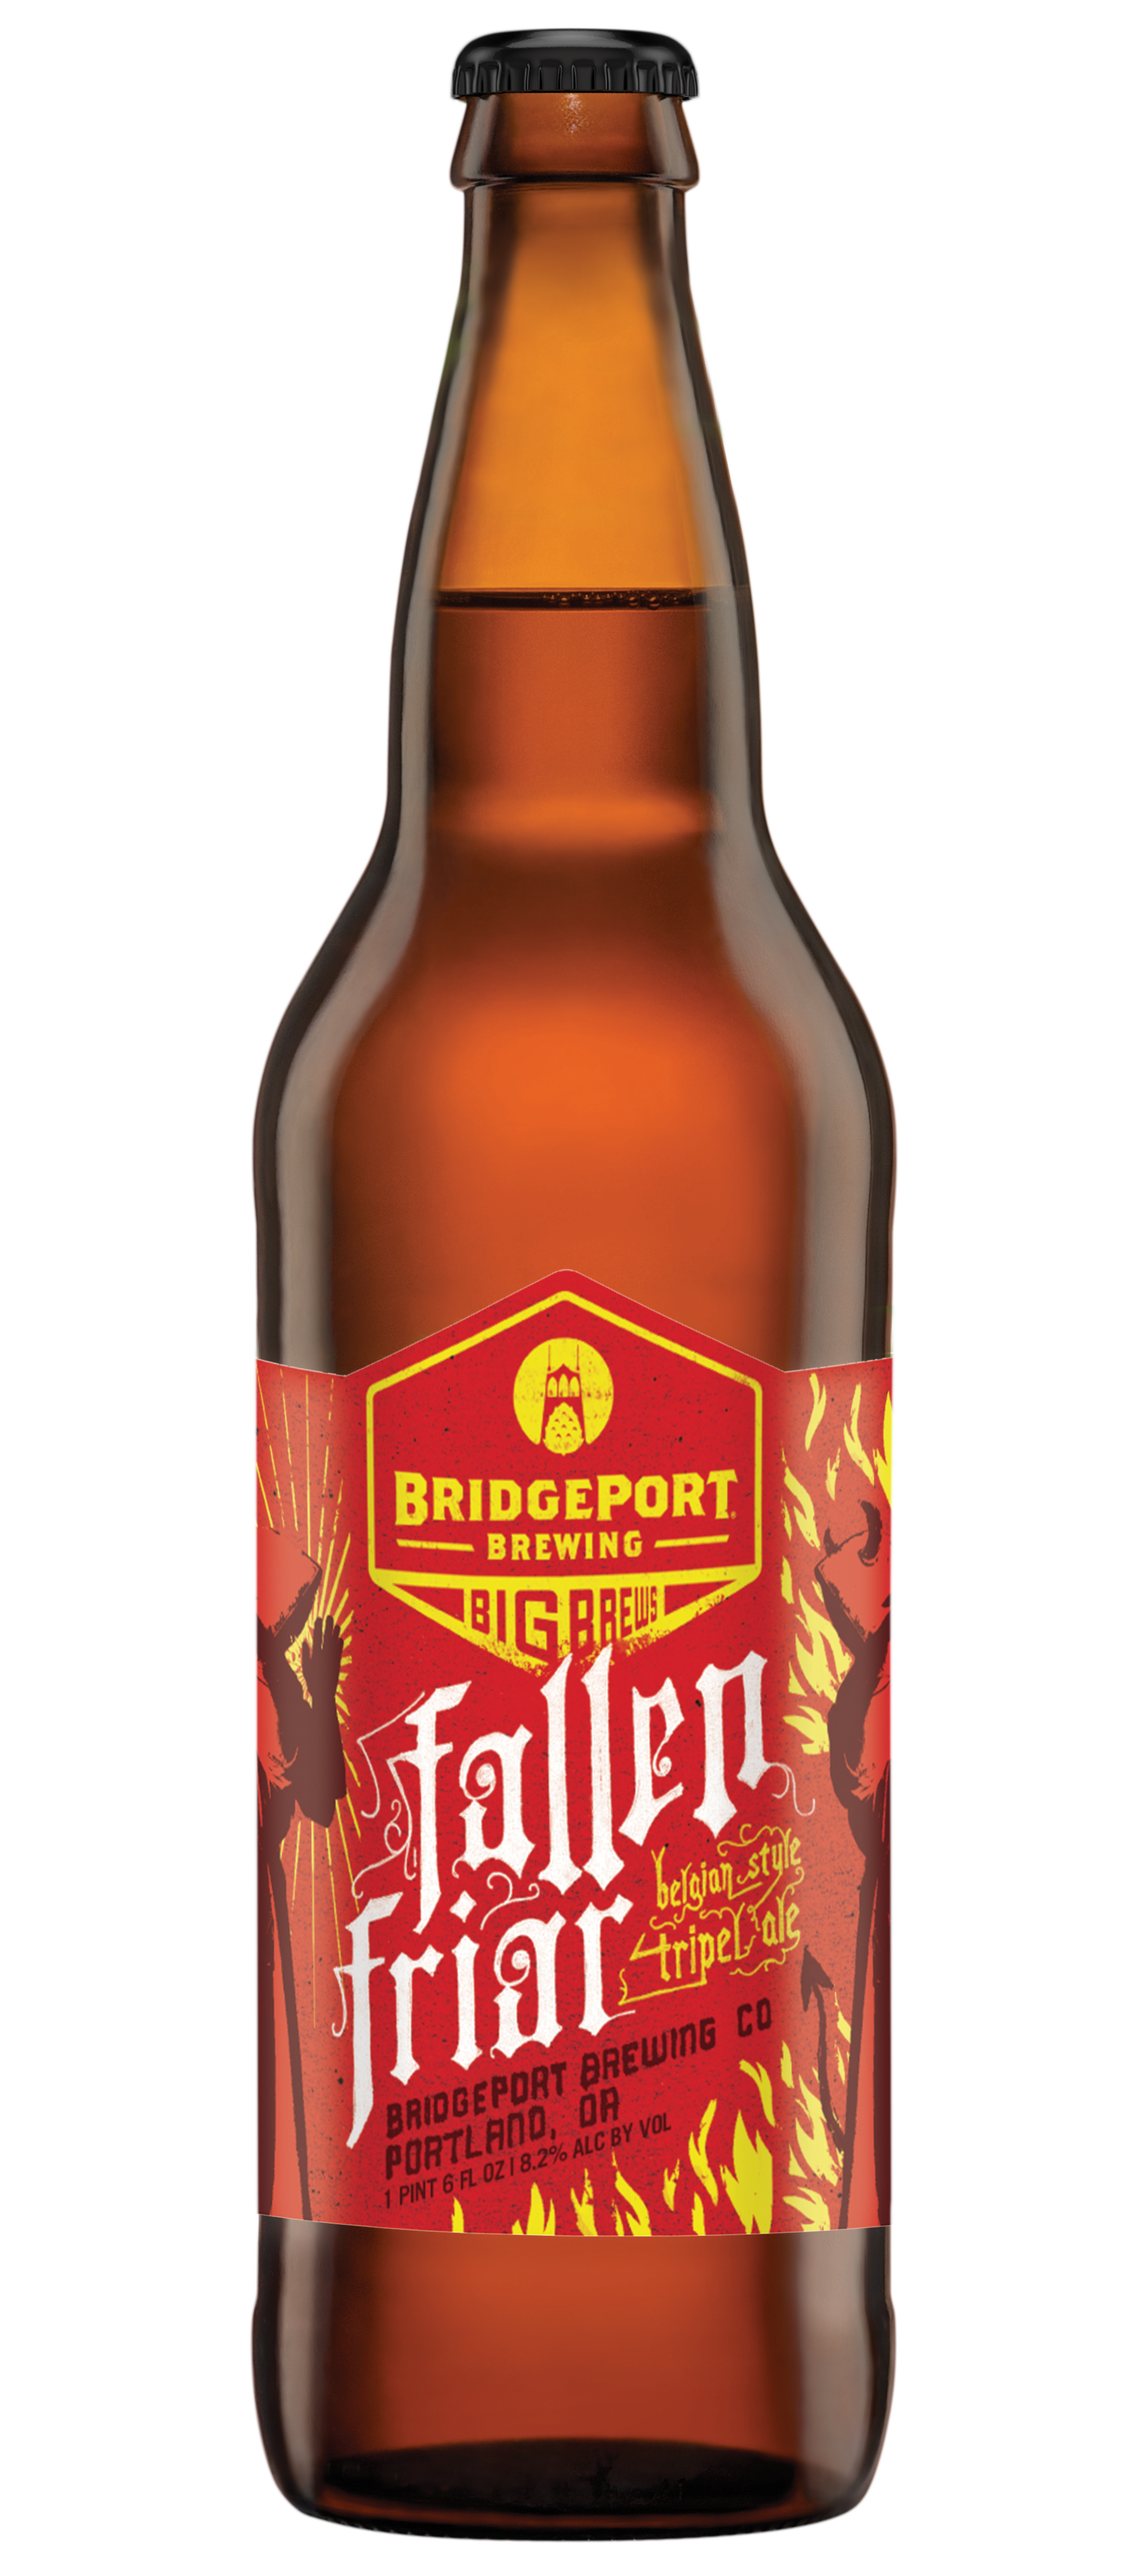 image courtesy Bridgeport Brewing Company